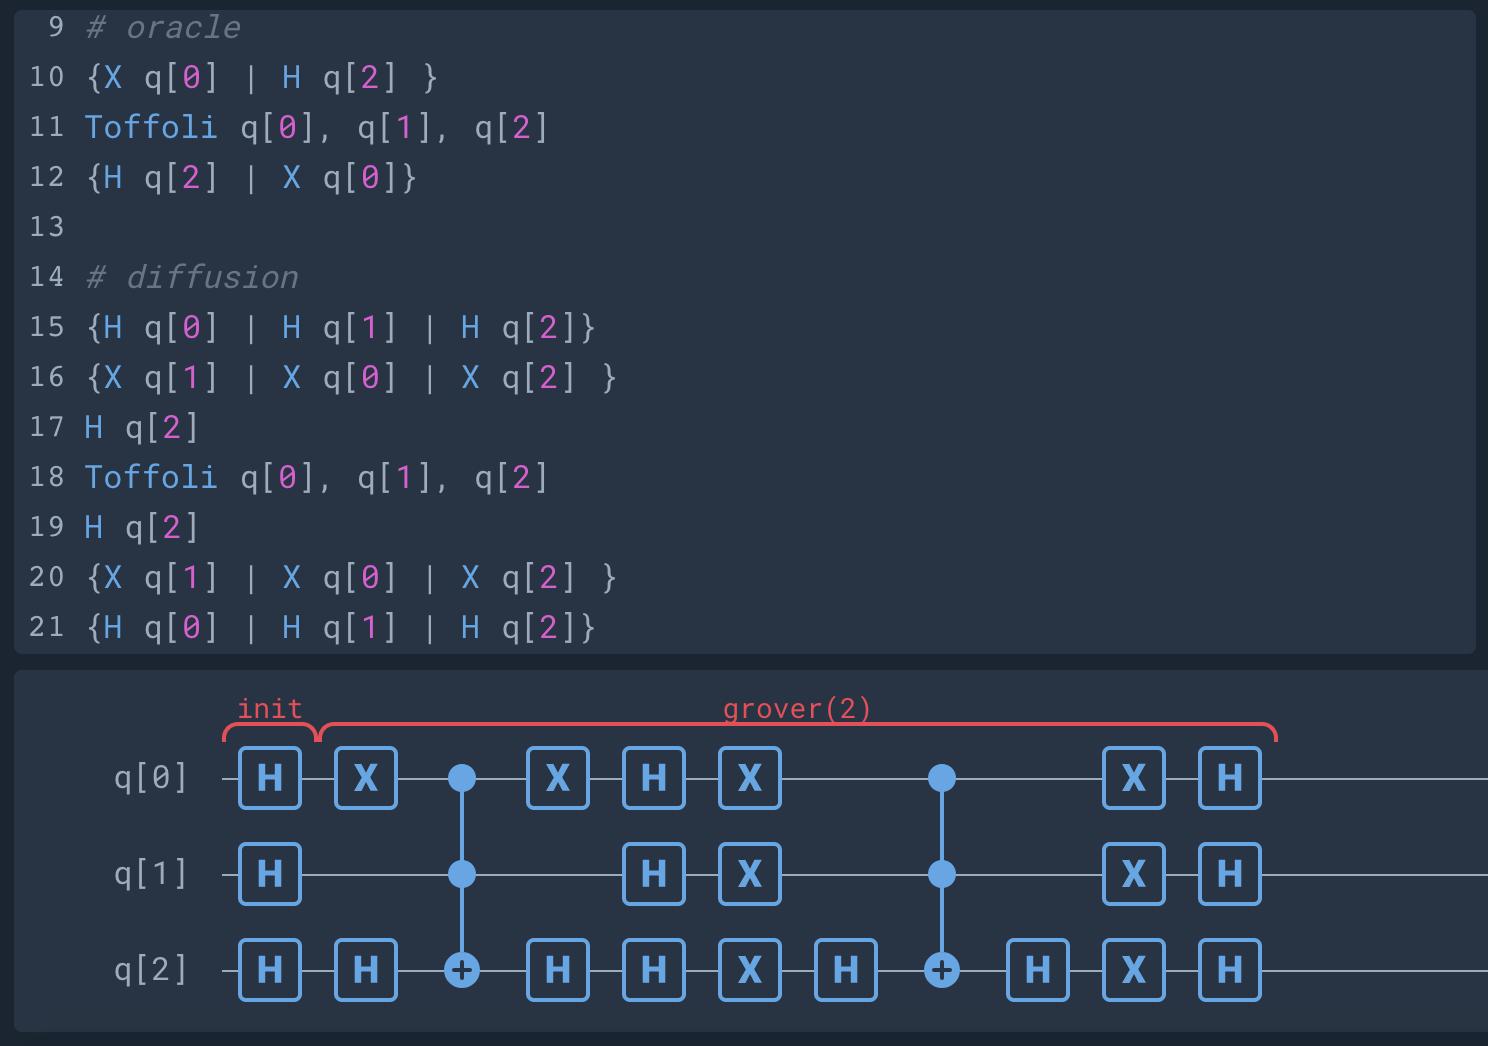 Groverův vyhledávací algoritmus v QASM a vizualiace v Quantum Inspire